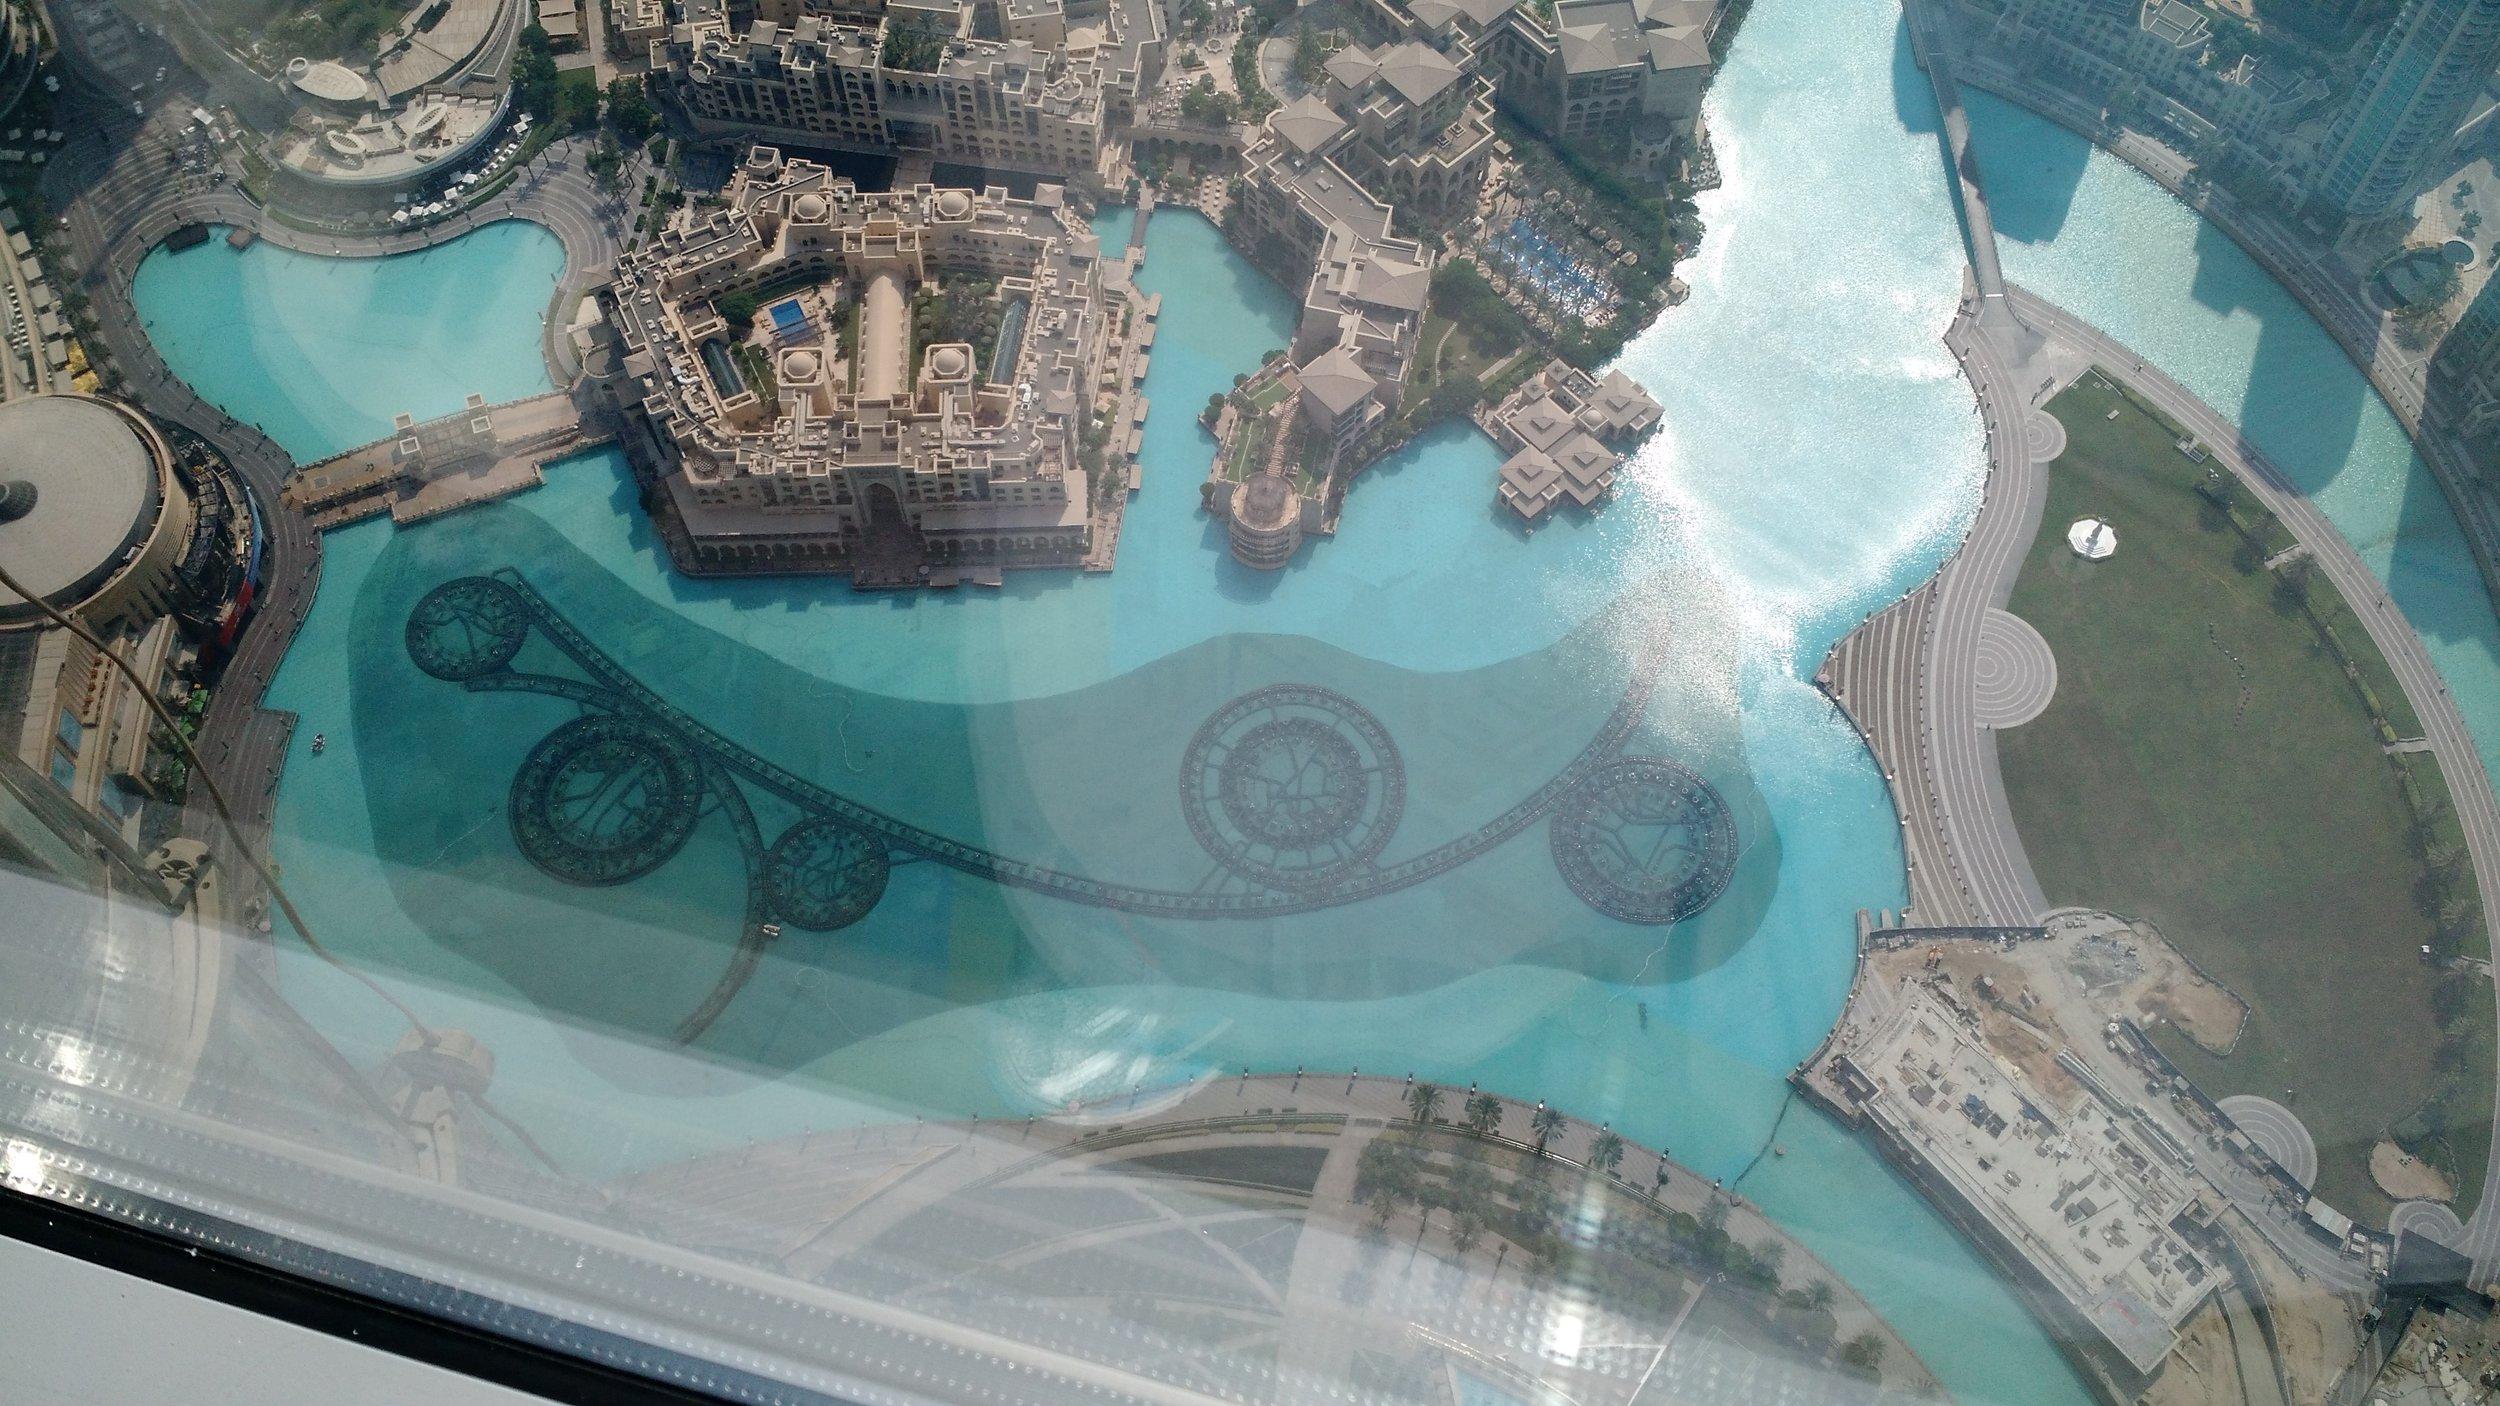 Dubai Fountain jet alignment; seen from Burj Khalifa At The Top viewing deck